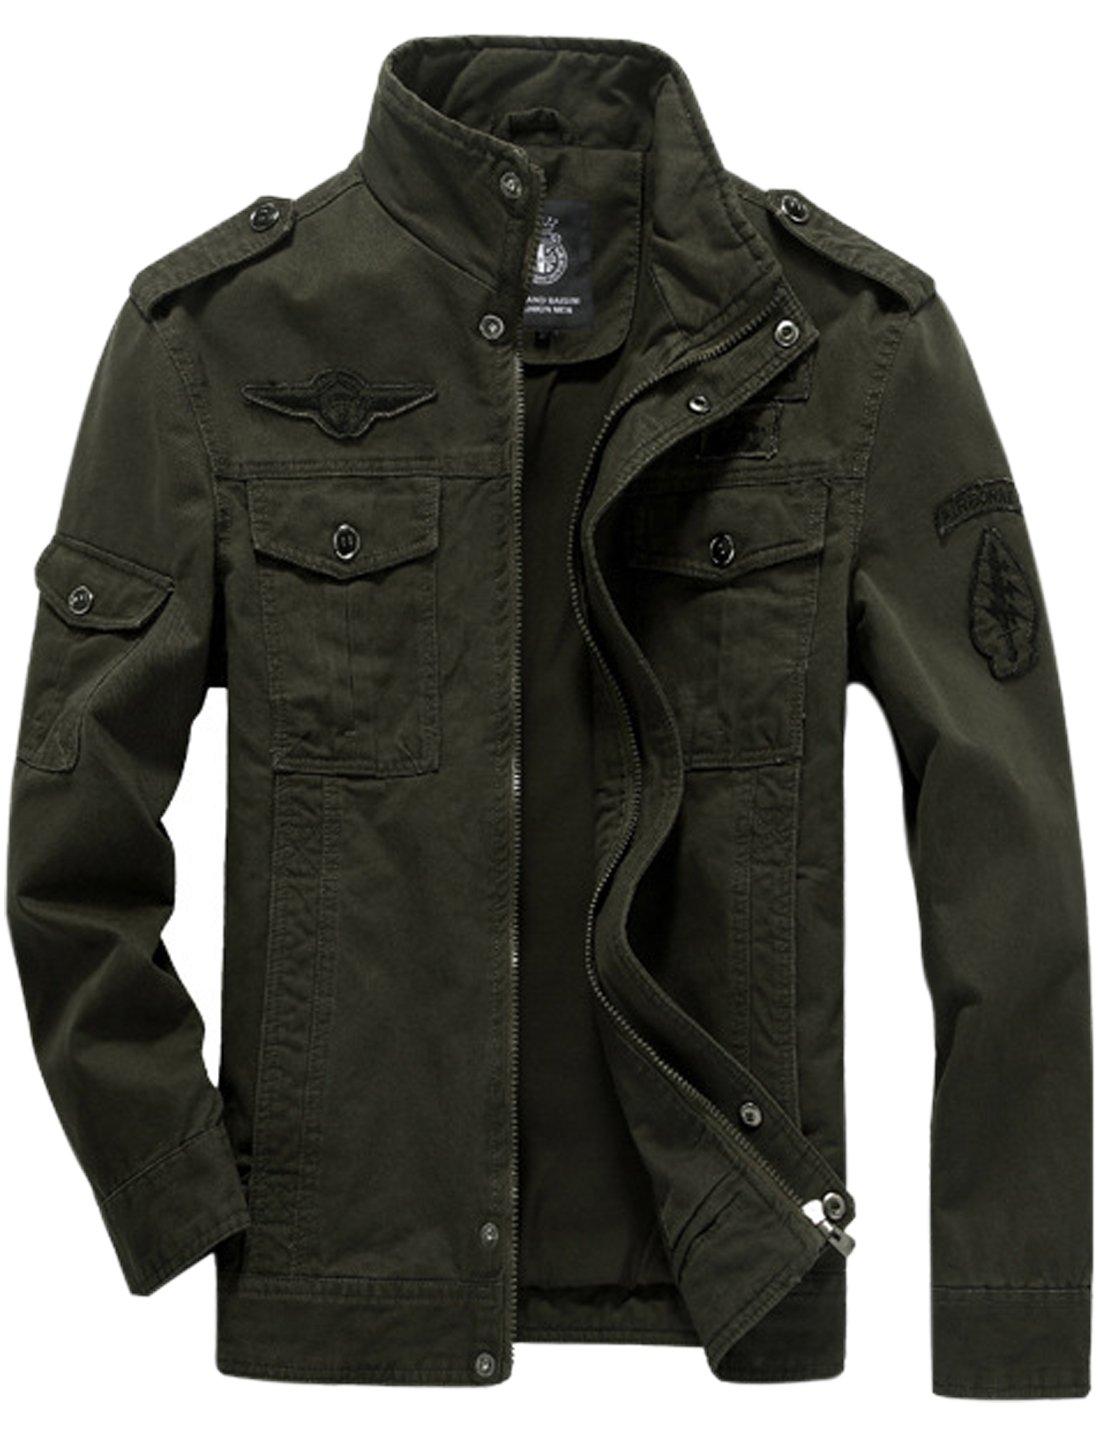 Springrain Men's Casual Slim Stand Collar Tooling Cotton Jackets (Medium, Army Green) by Springrain